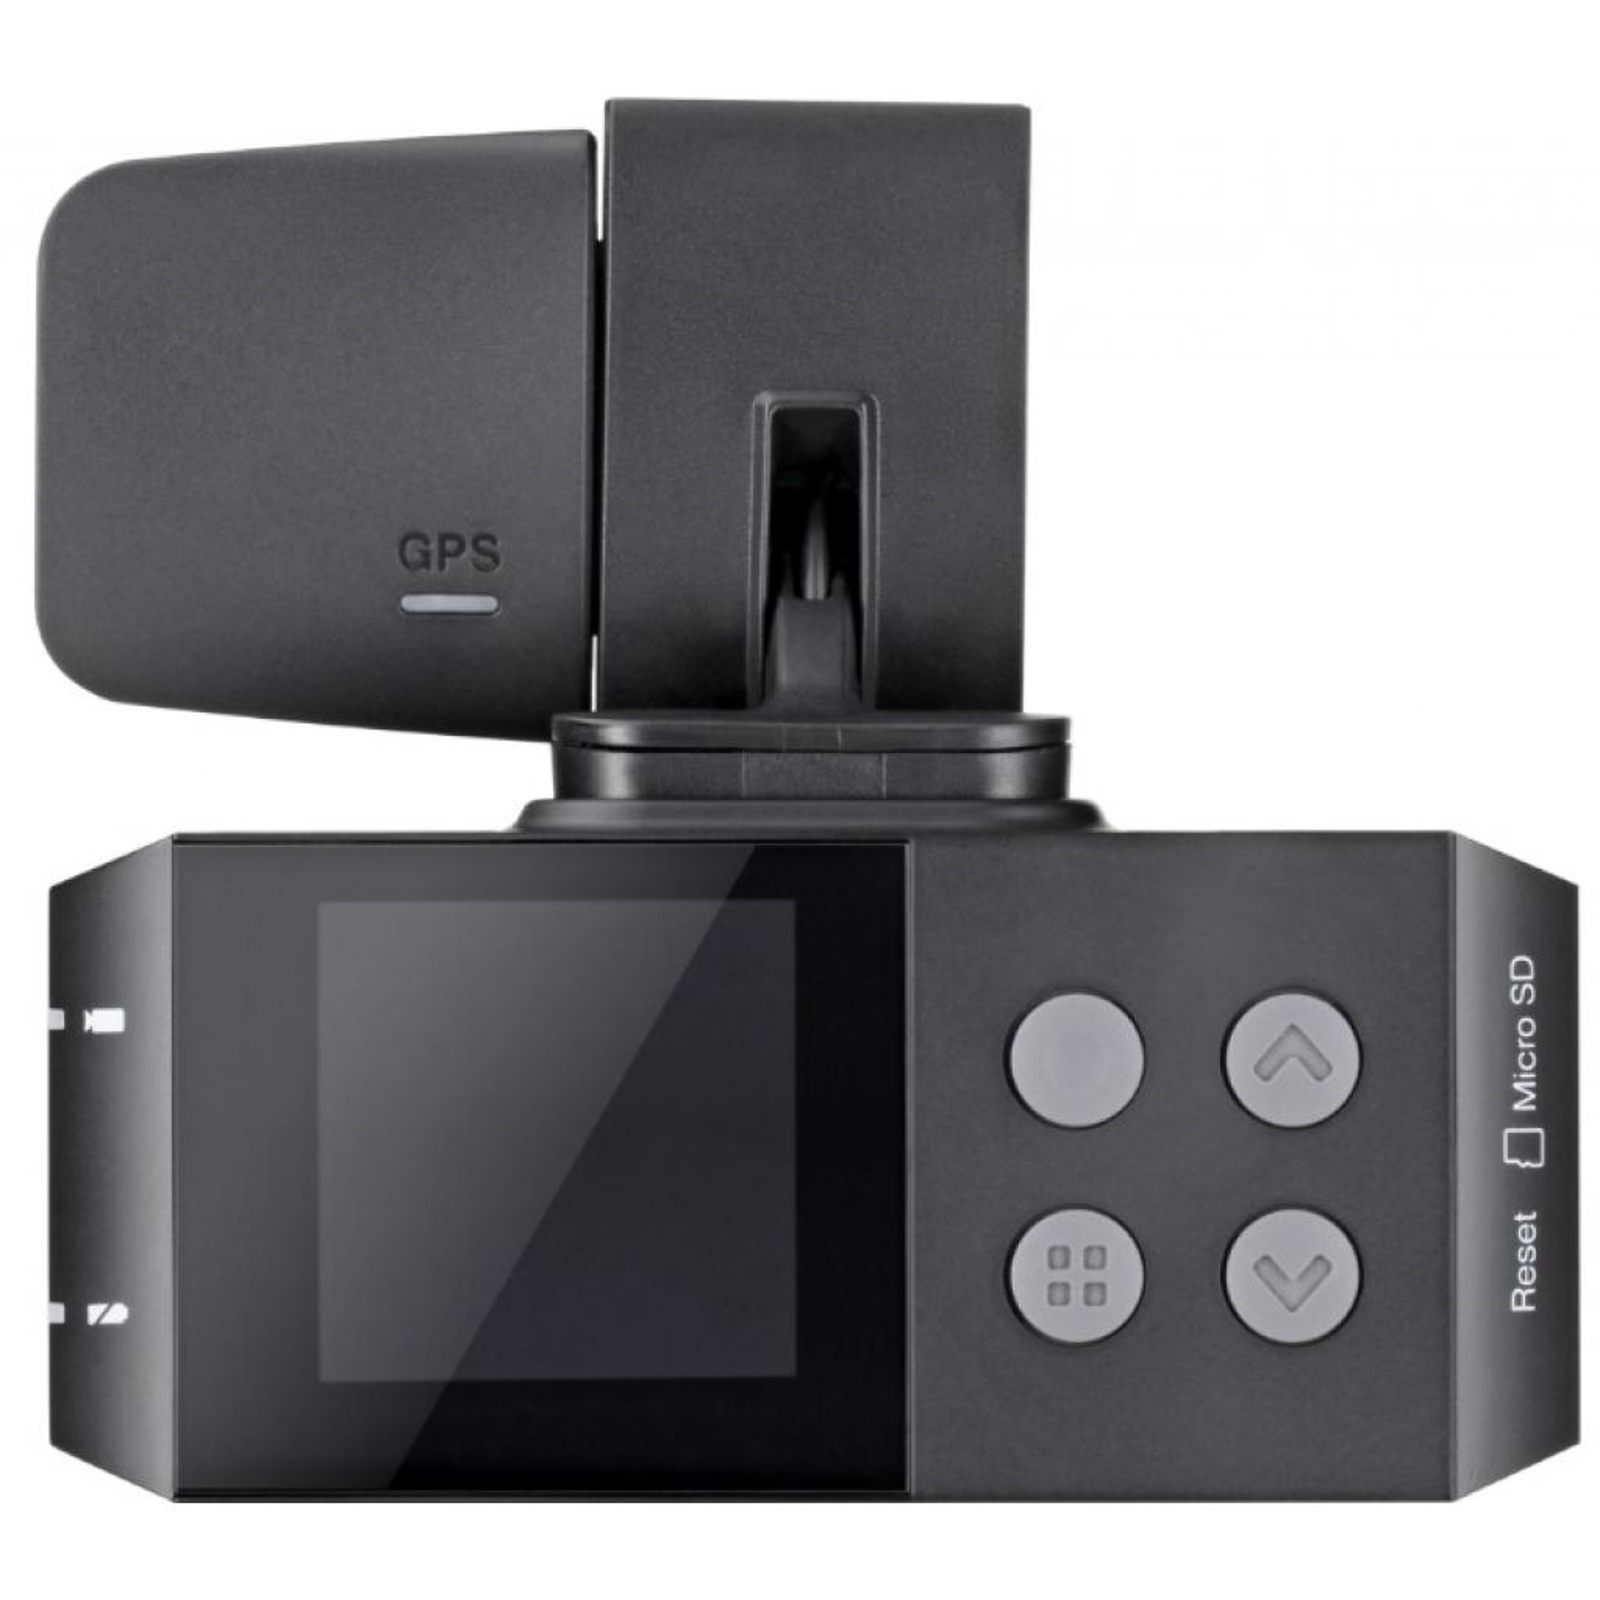 Відеореєстратор 2E Drive 700 Magnet (2E-DRIVE700MAGNET) зображення 5